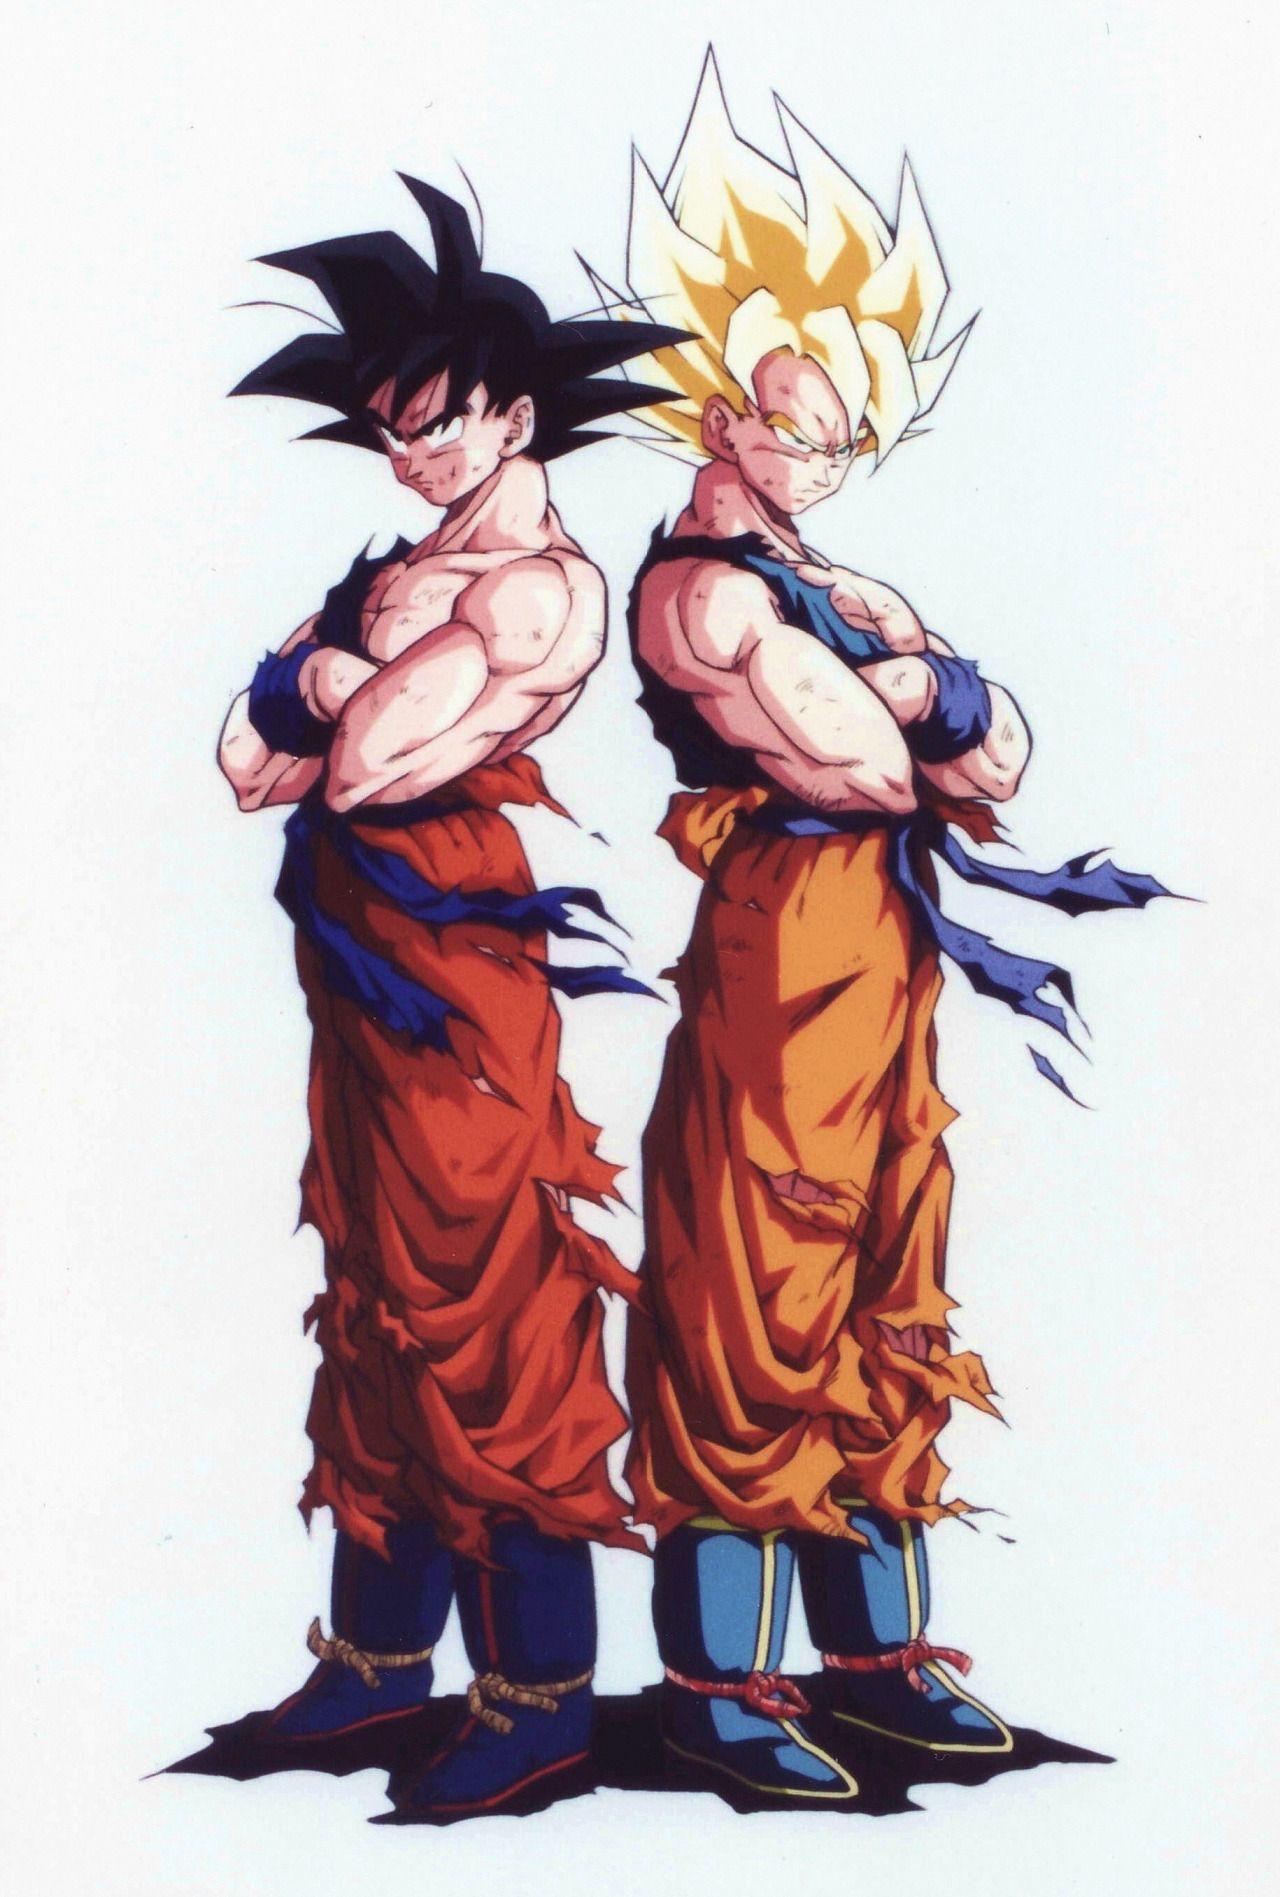 80s90sdragonballart Dragones Personajes De Goku Dragon Ball Gt